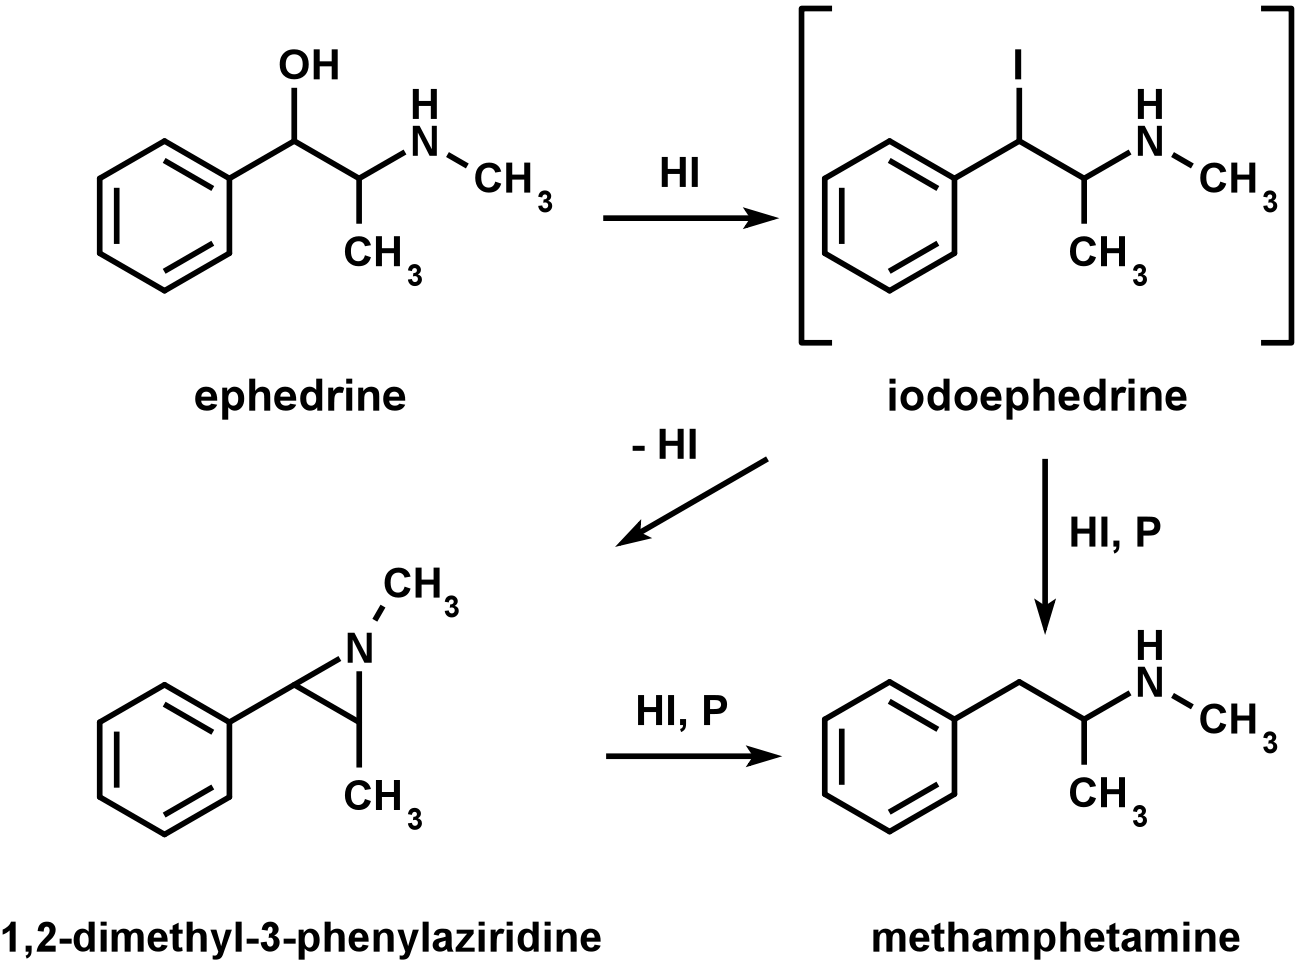 Red Phosphorous/Iodine Methamphetamine Synthesis